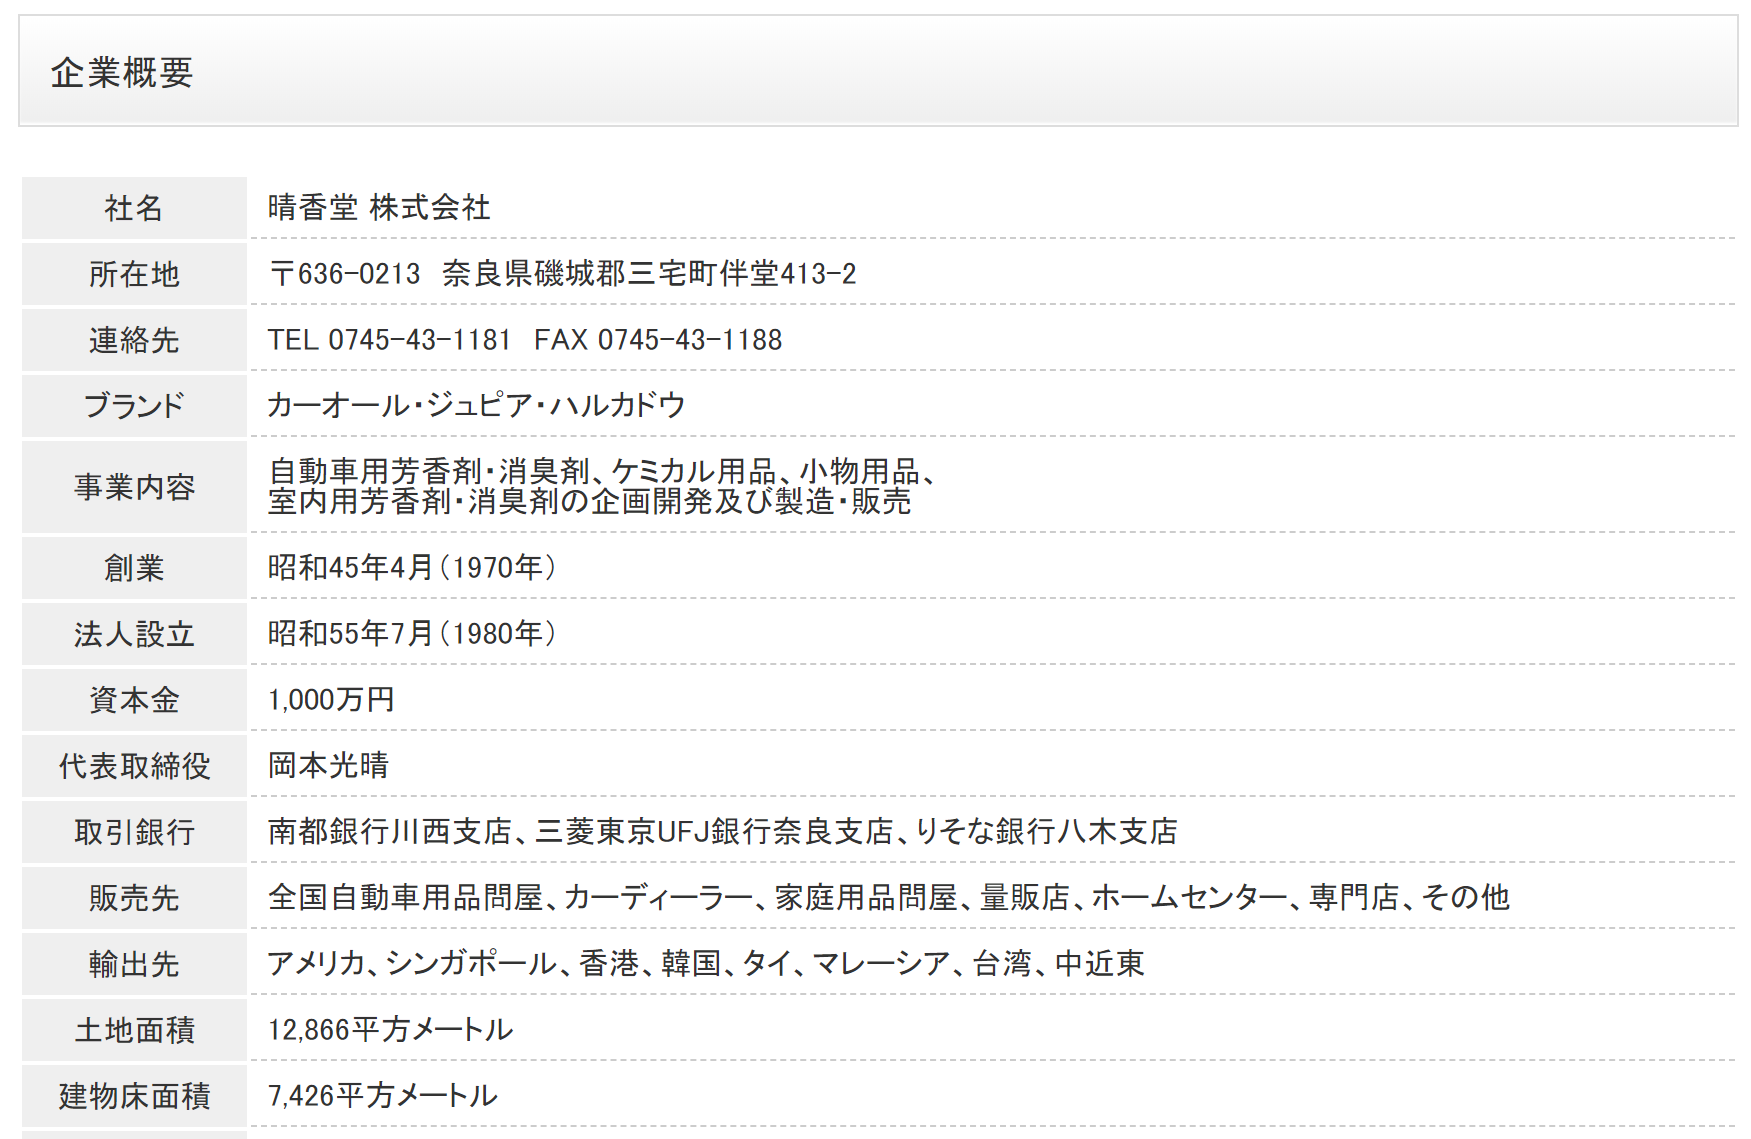 Reay Stock!!! VANZO Perfume / Carall Regalia Perfume All Series [KL Seller] New Generation Japan Import Dashboard Healthy Interior Perfume Untuk Singkirkan Bau Hapak Di Dalam Kereta